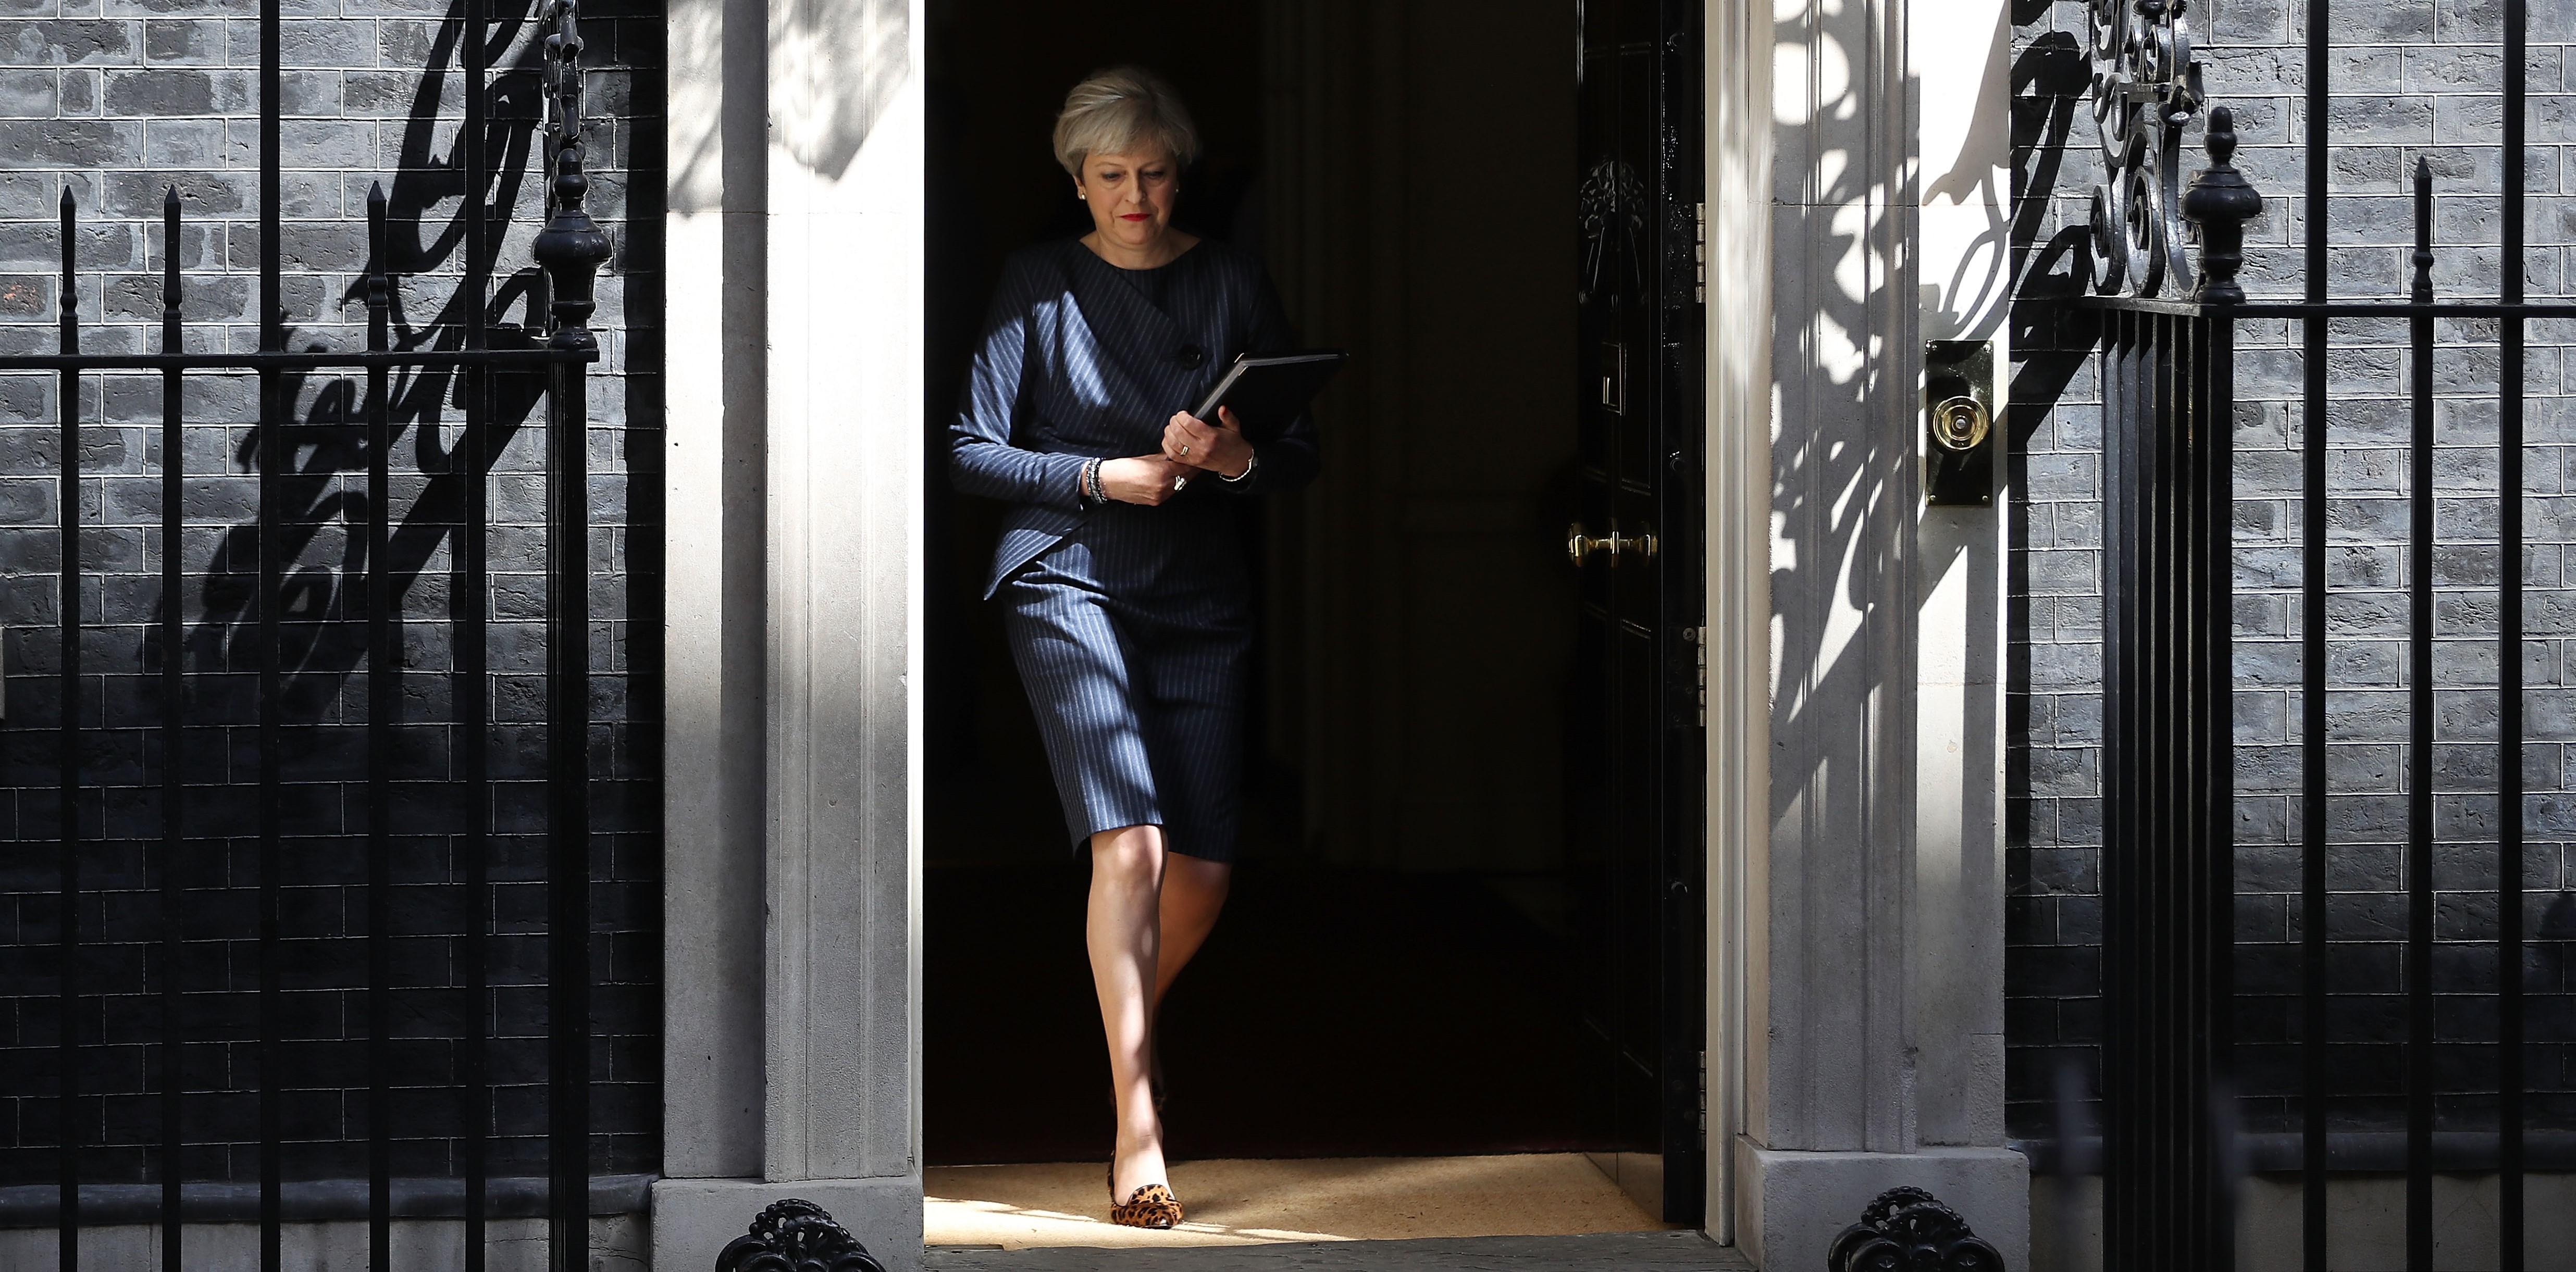 Photo: Getty Images/Dan Kitwood